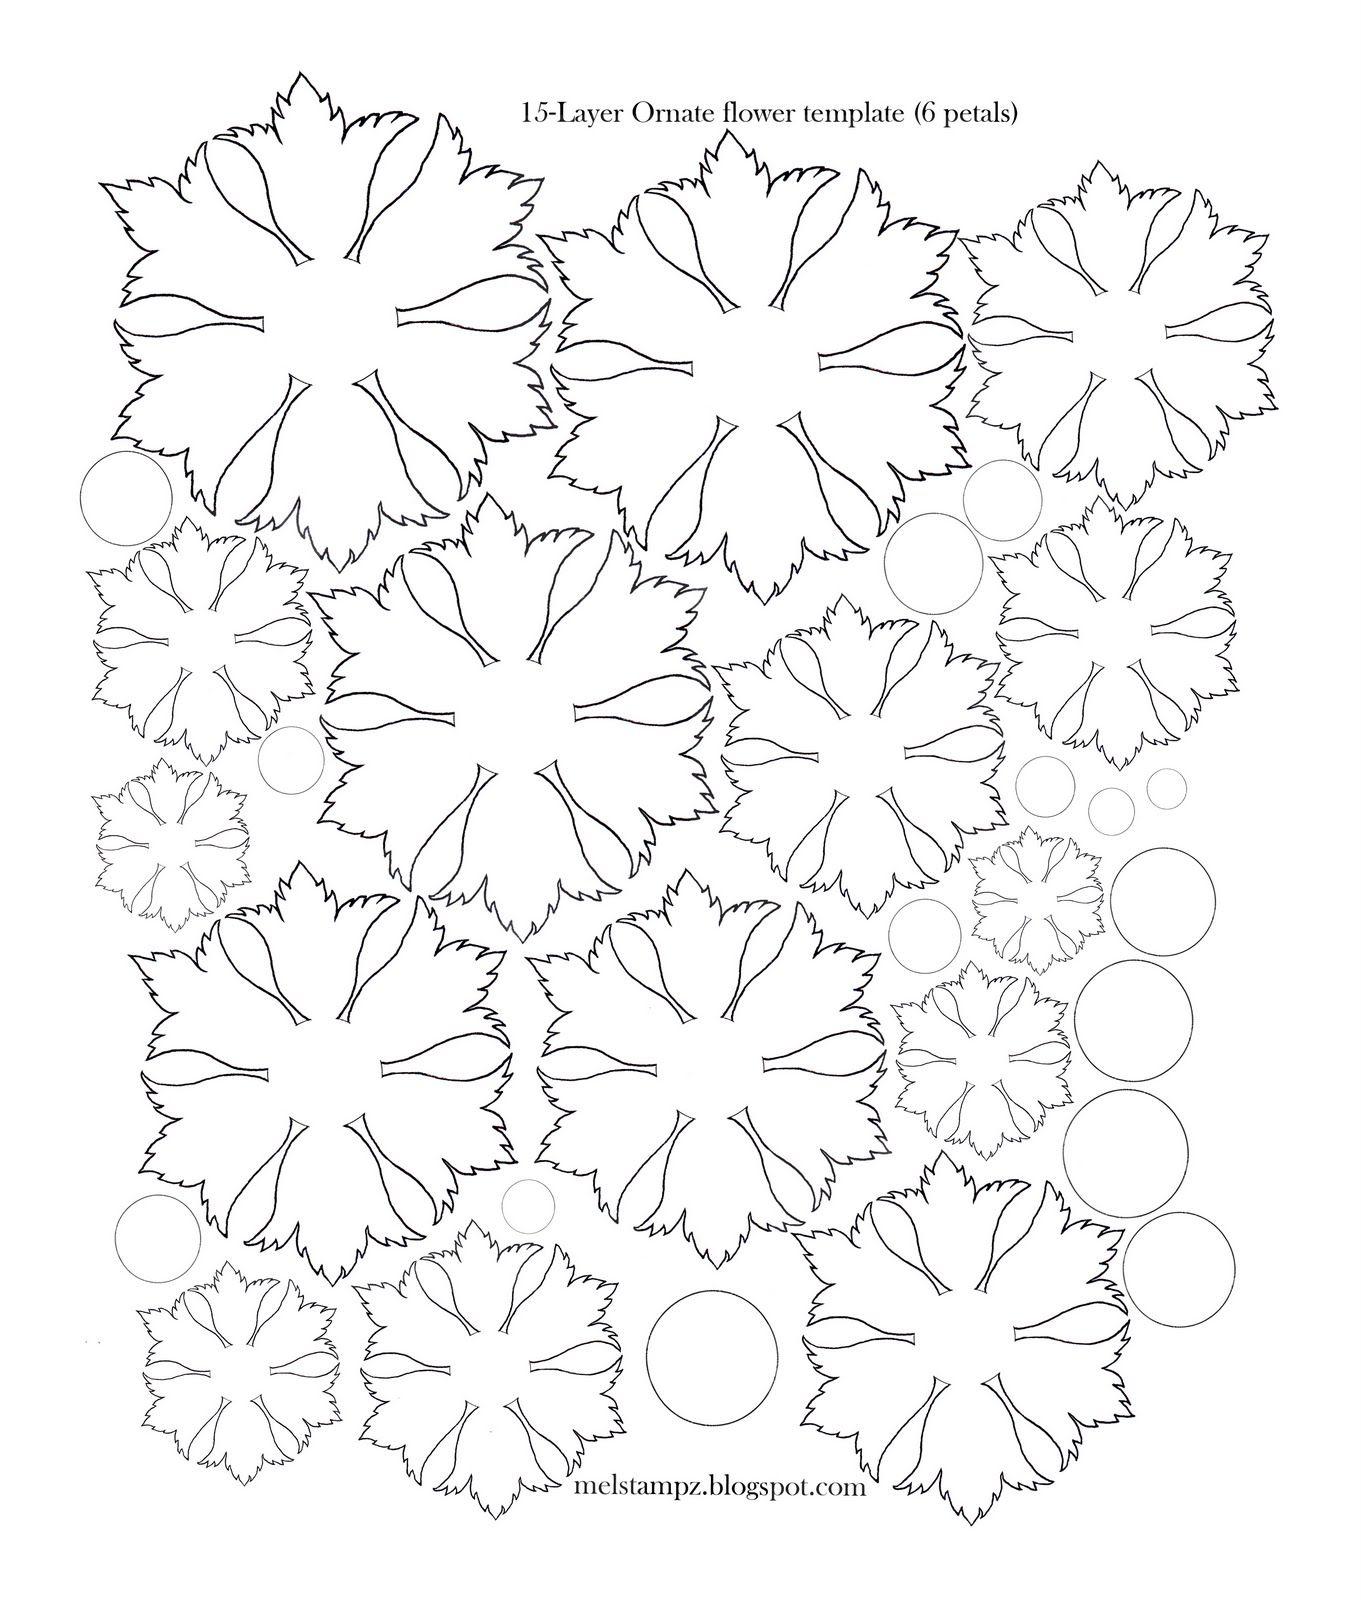 Mel Stampz 6 Petal Ornate Flower Template Svg Cutting Machines